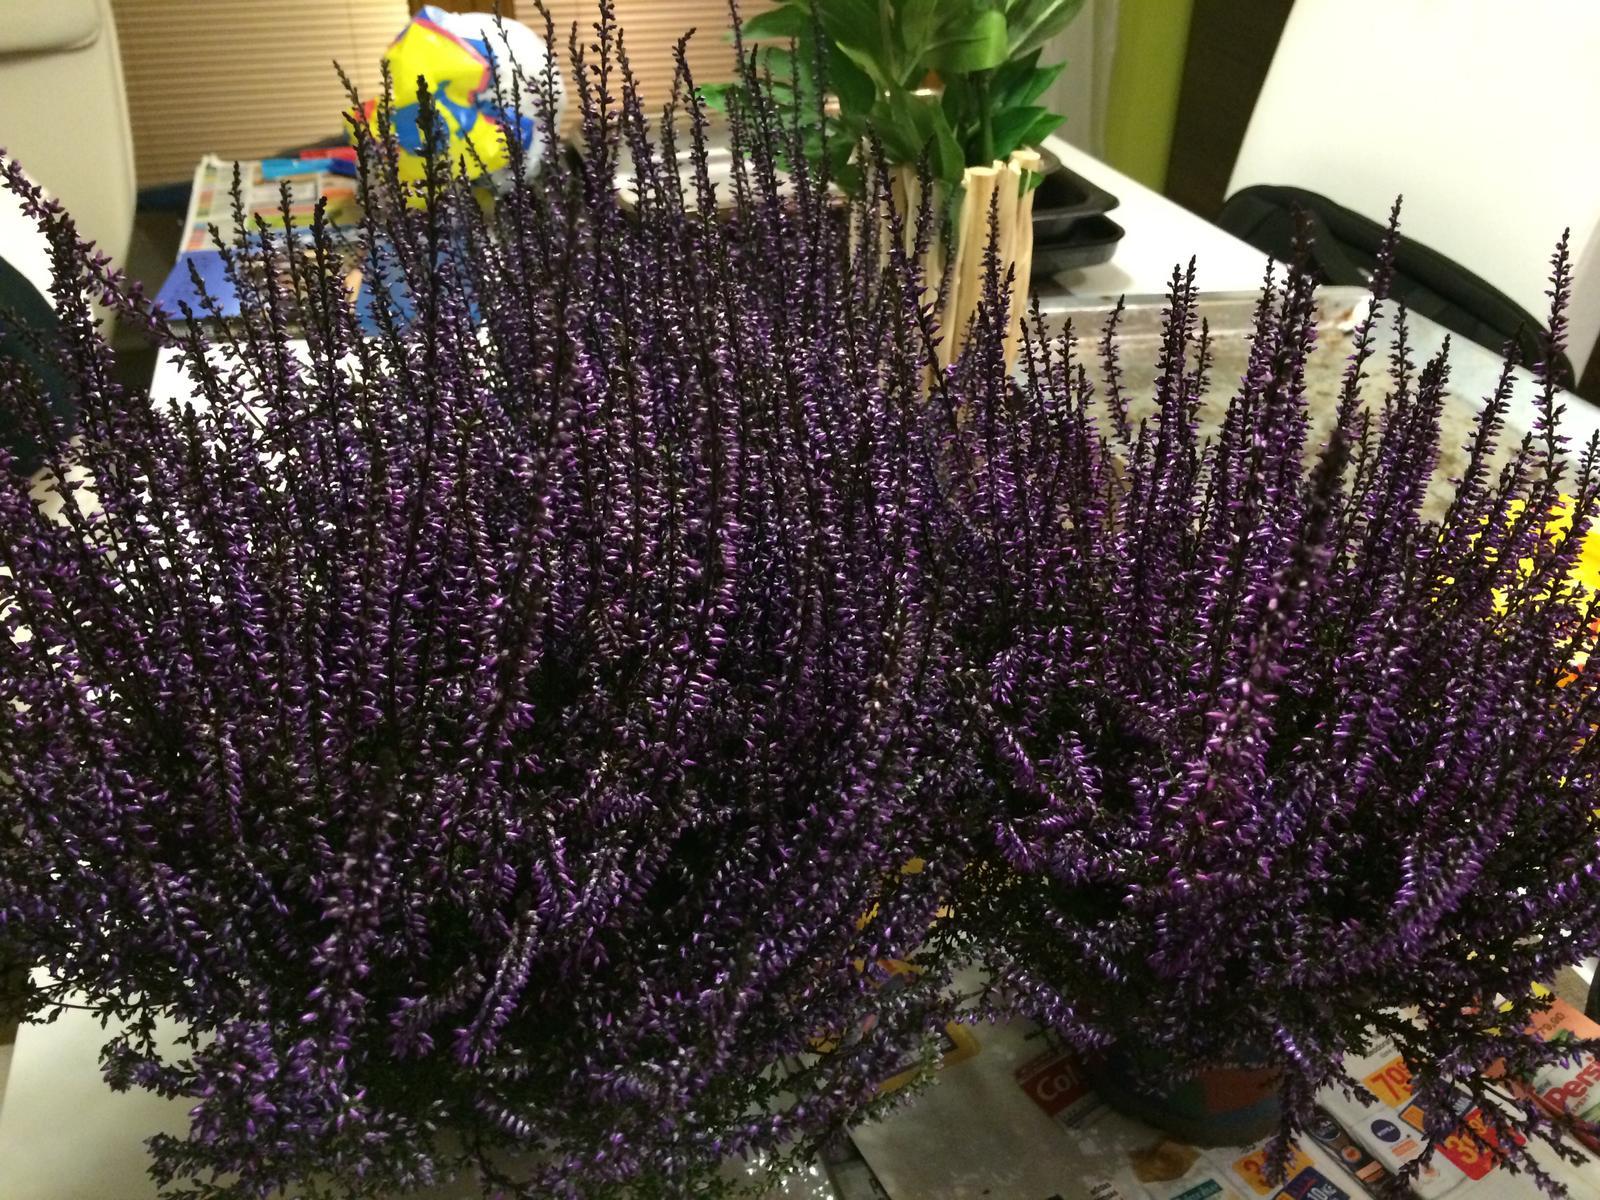 Zahradka nasa 2015 - Dalsie kusky :) zajtra sa s vresoviskom zacina :)